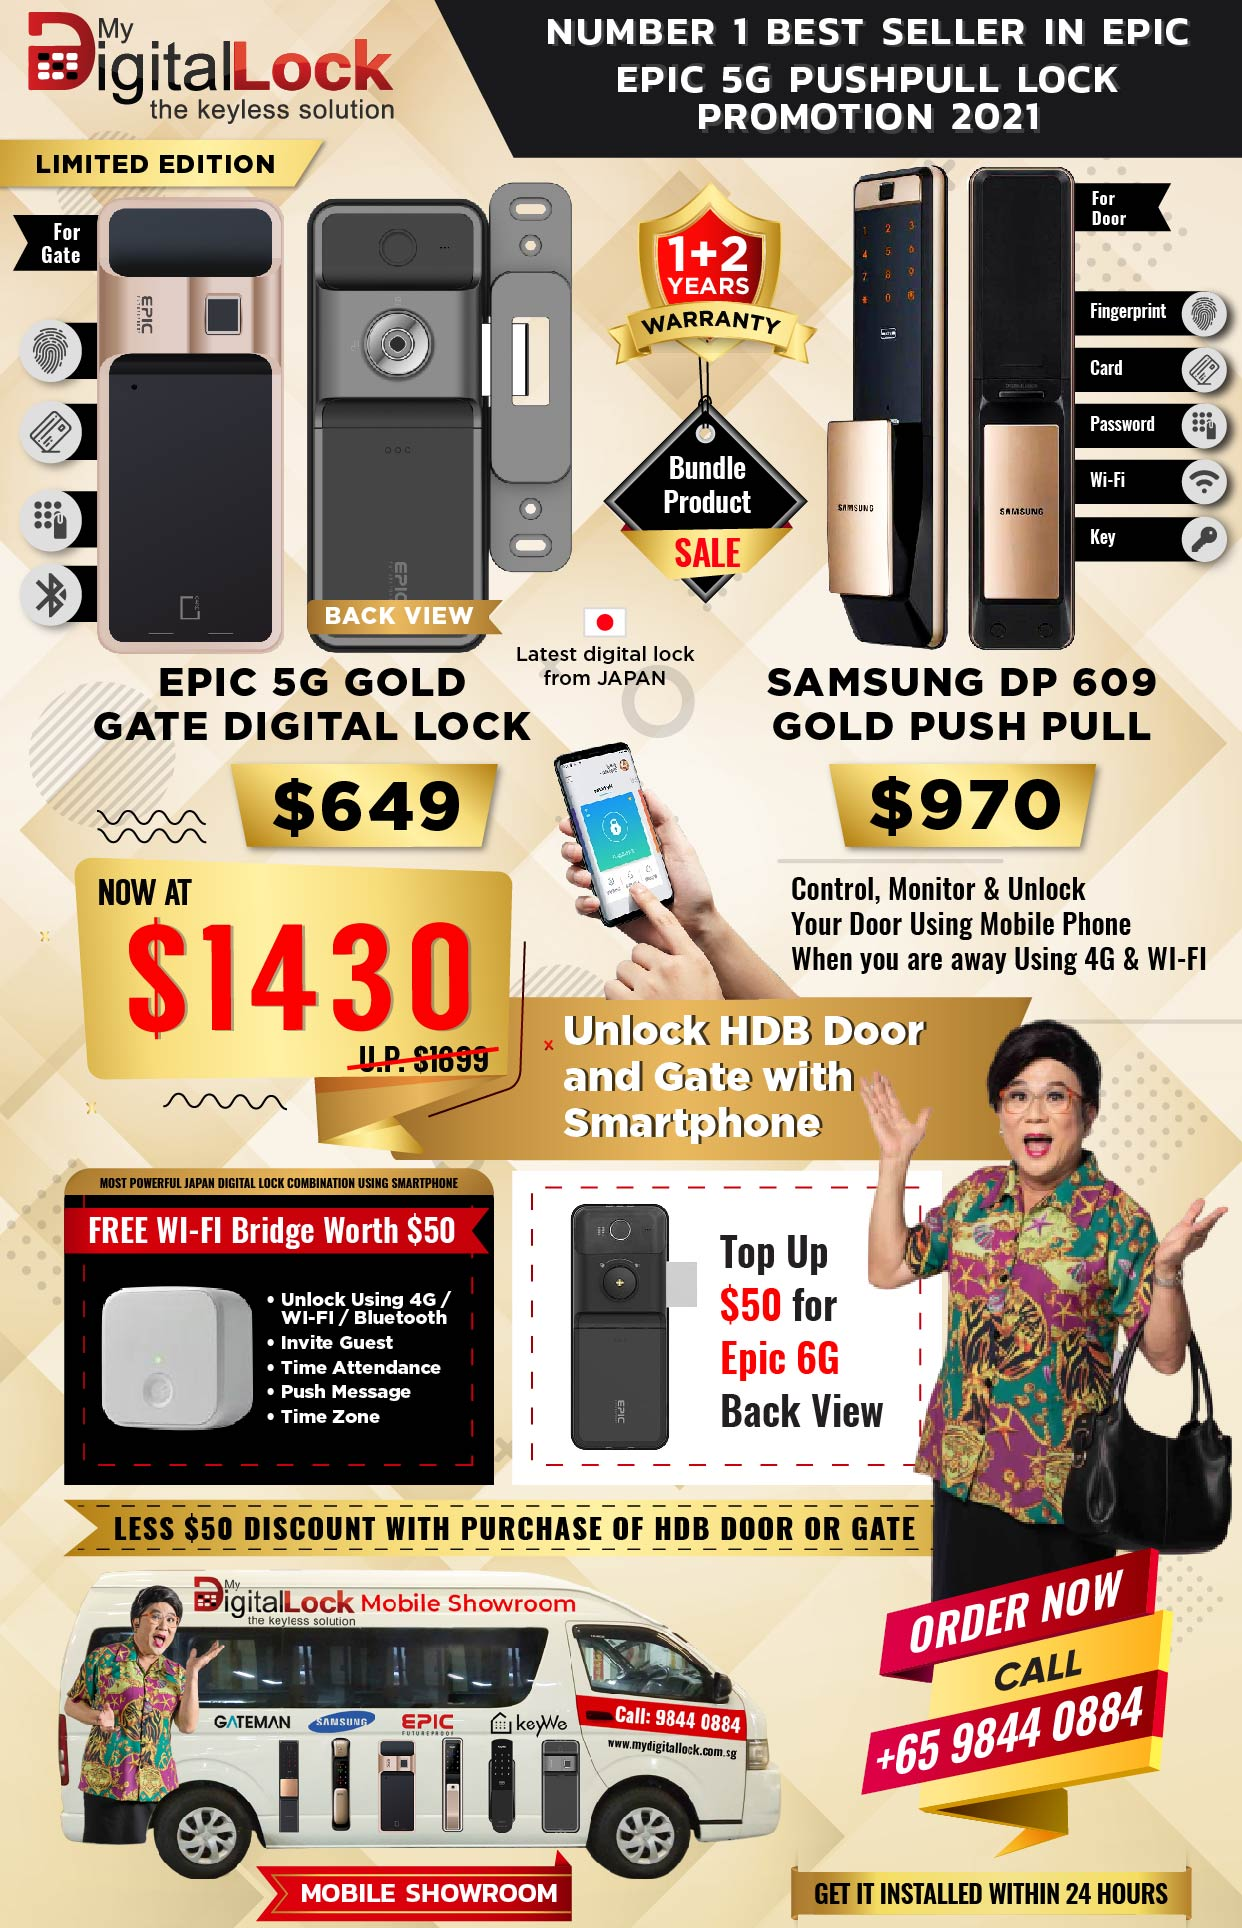 Samsung DP 609 Gold Push Pull Banner